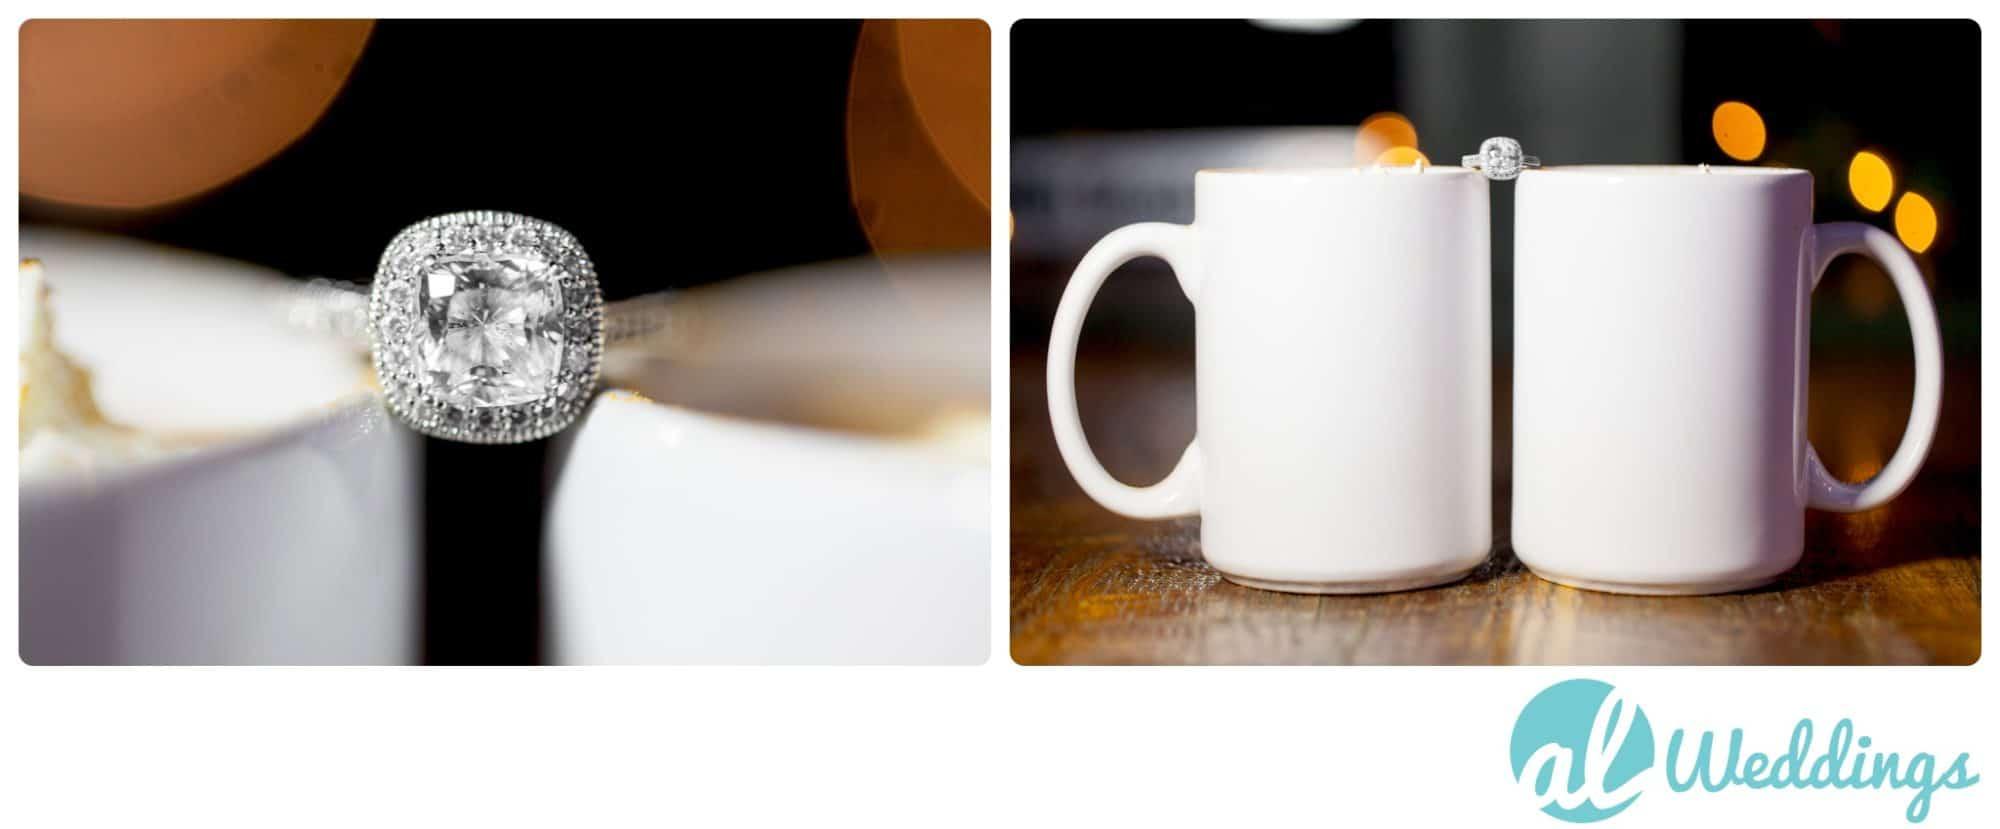 Birmingham,Coffee,Ohenrys,engagement,